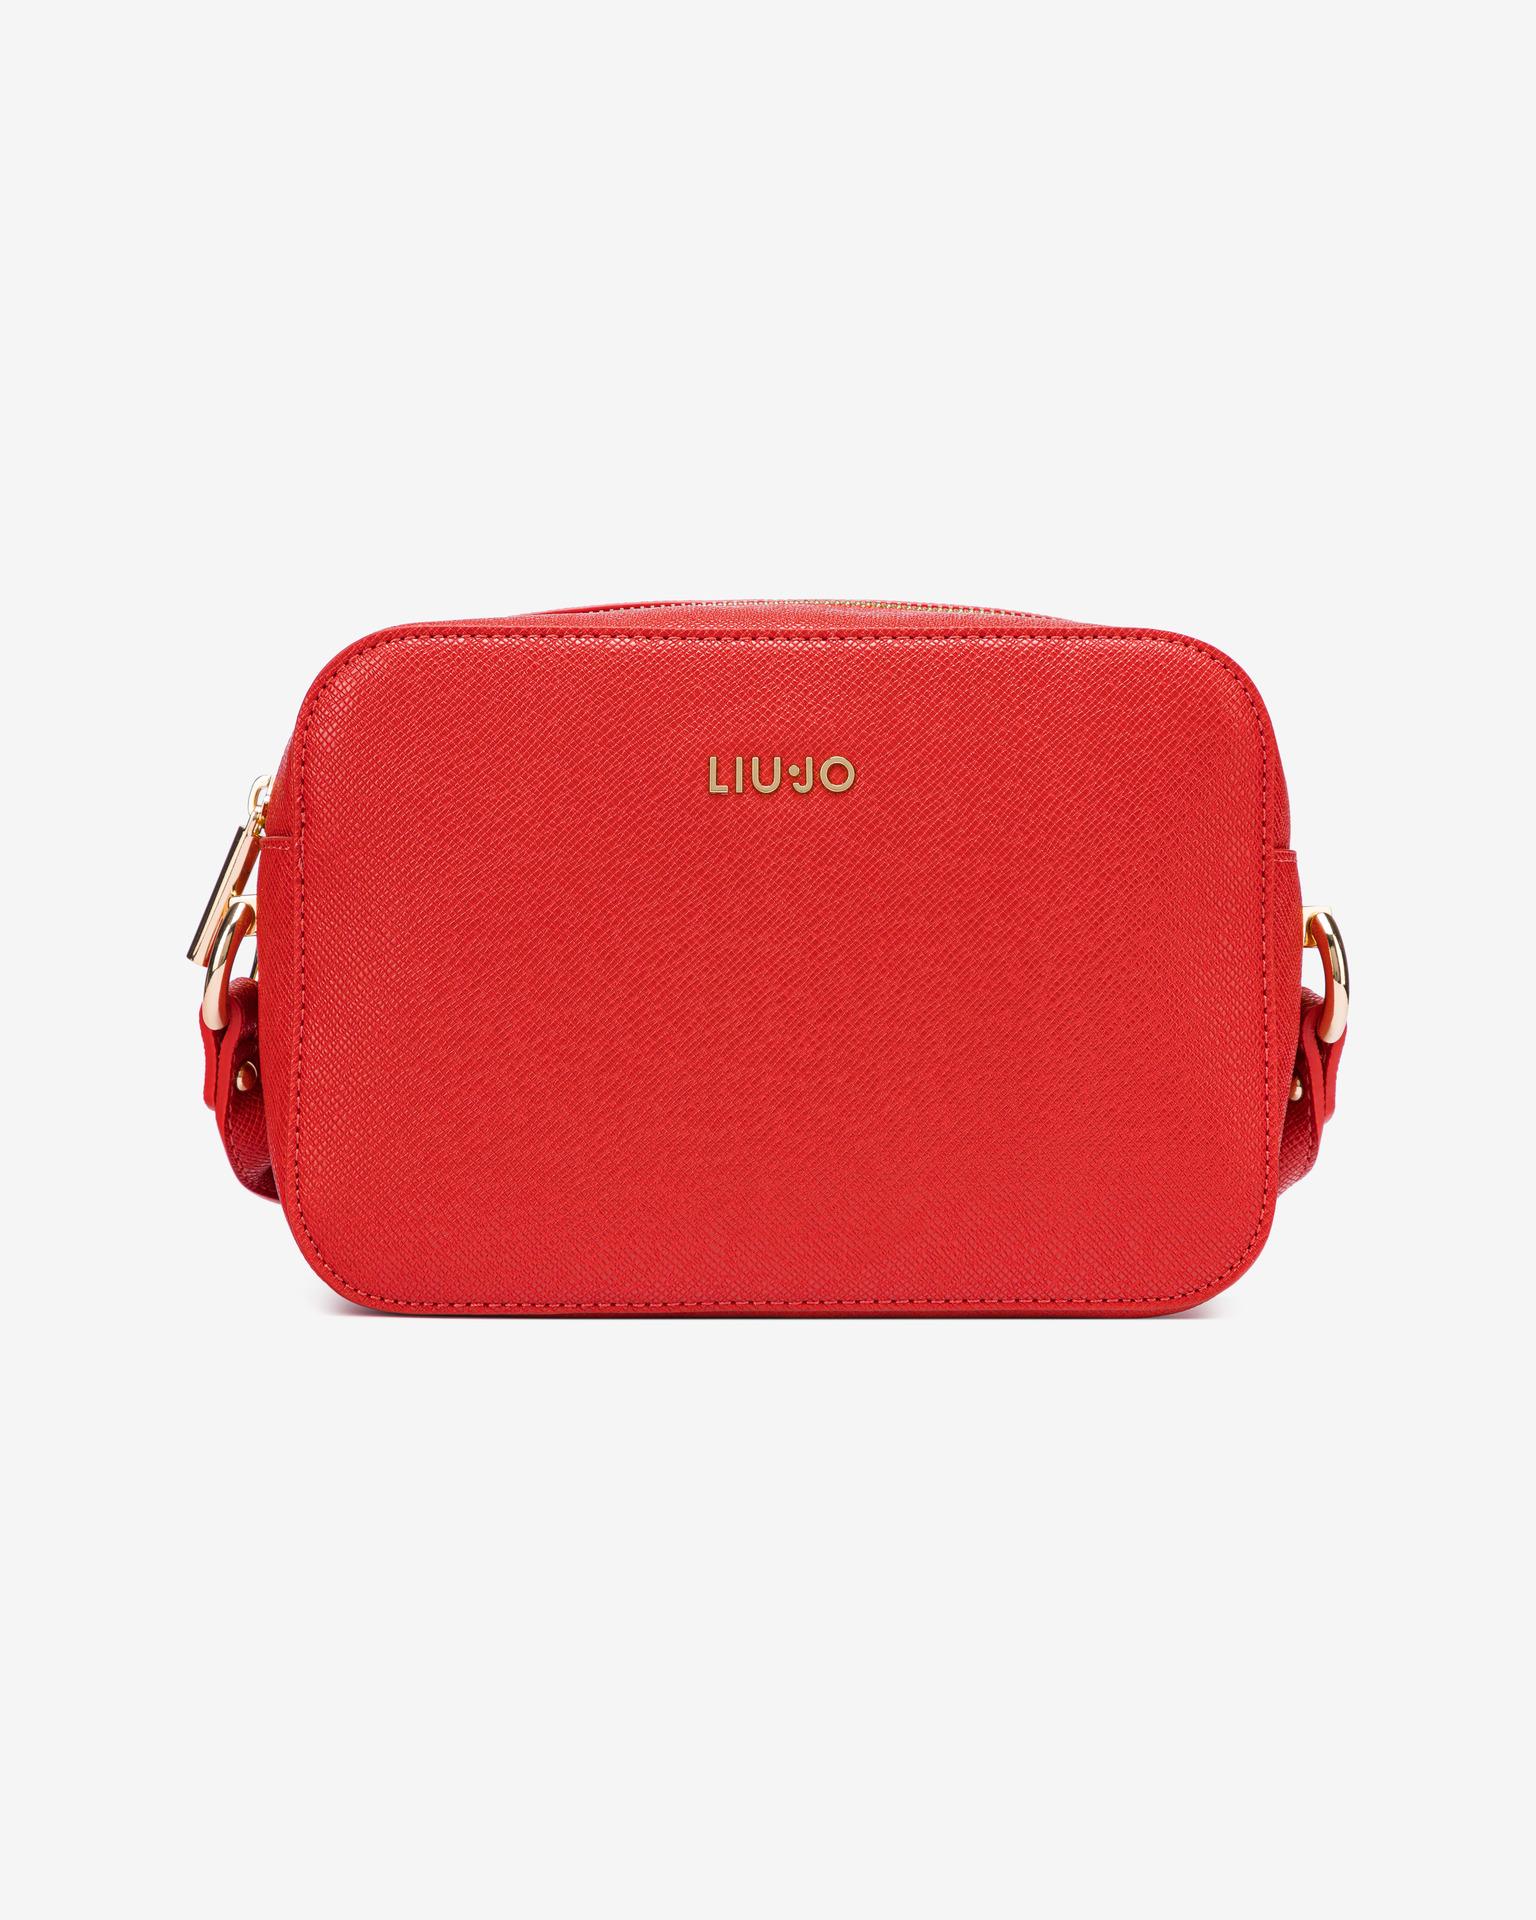 Liu Jo rosso crossbody borsa